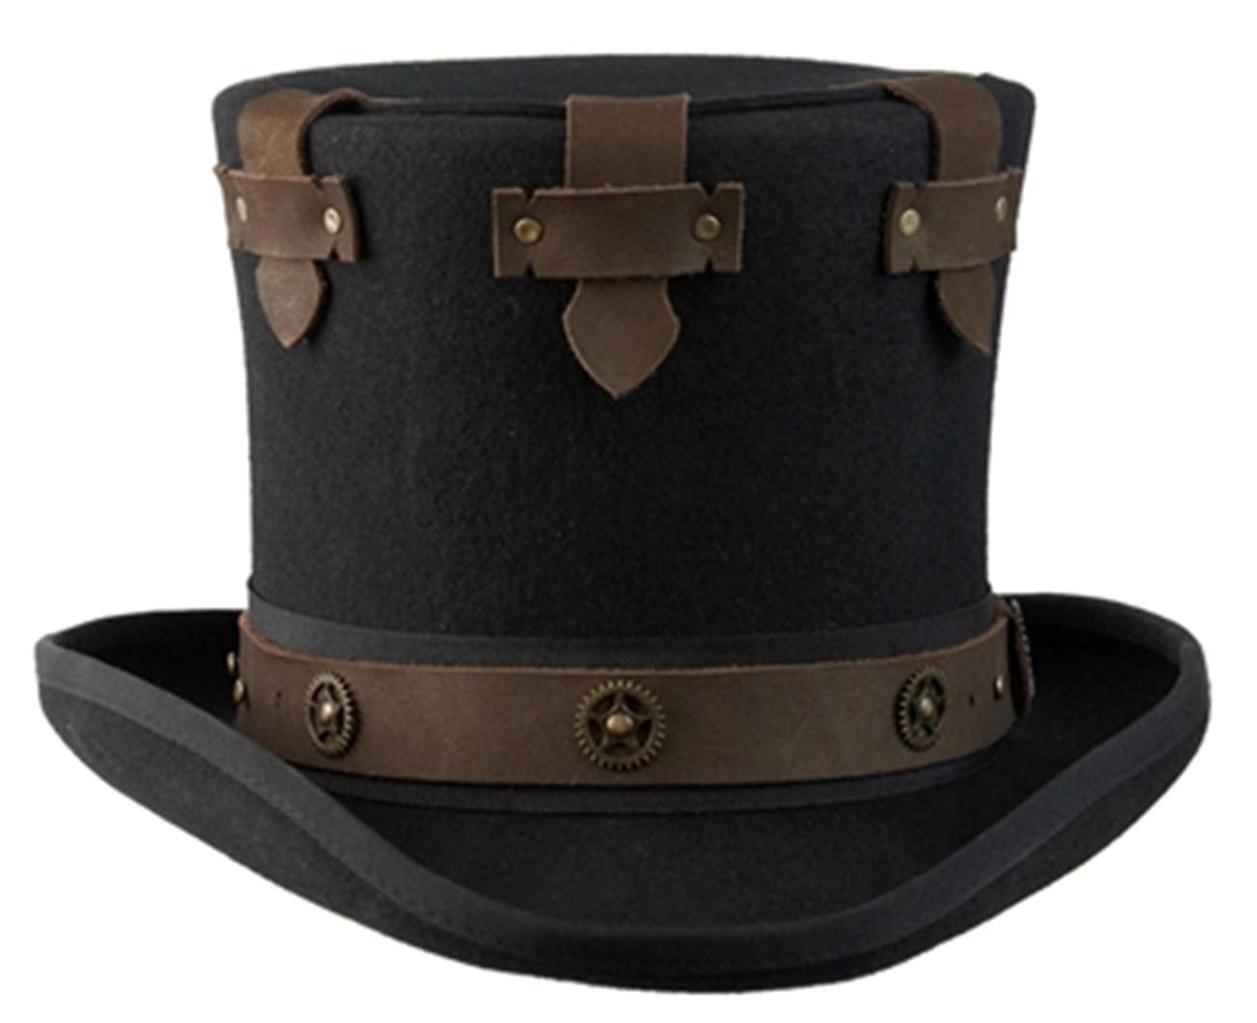 NEW Conner Hats STEAMPUNK Hat Australian Wool Secret Compartment Top Hat STEAMPUNK C1070 4fb4f0